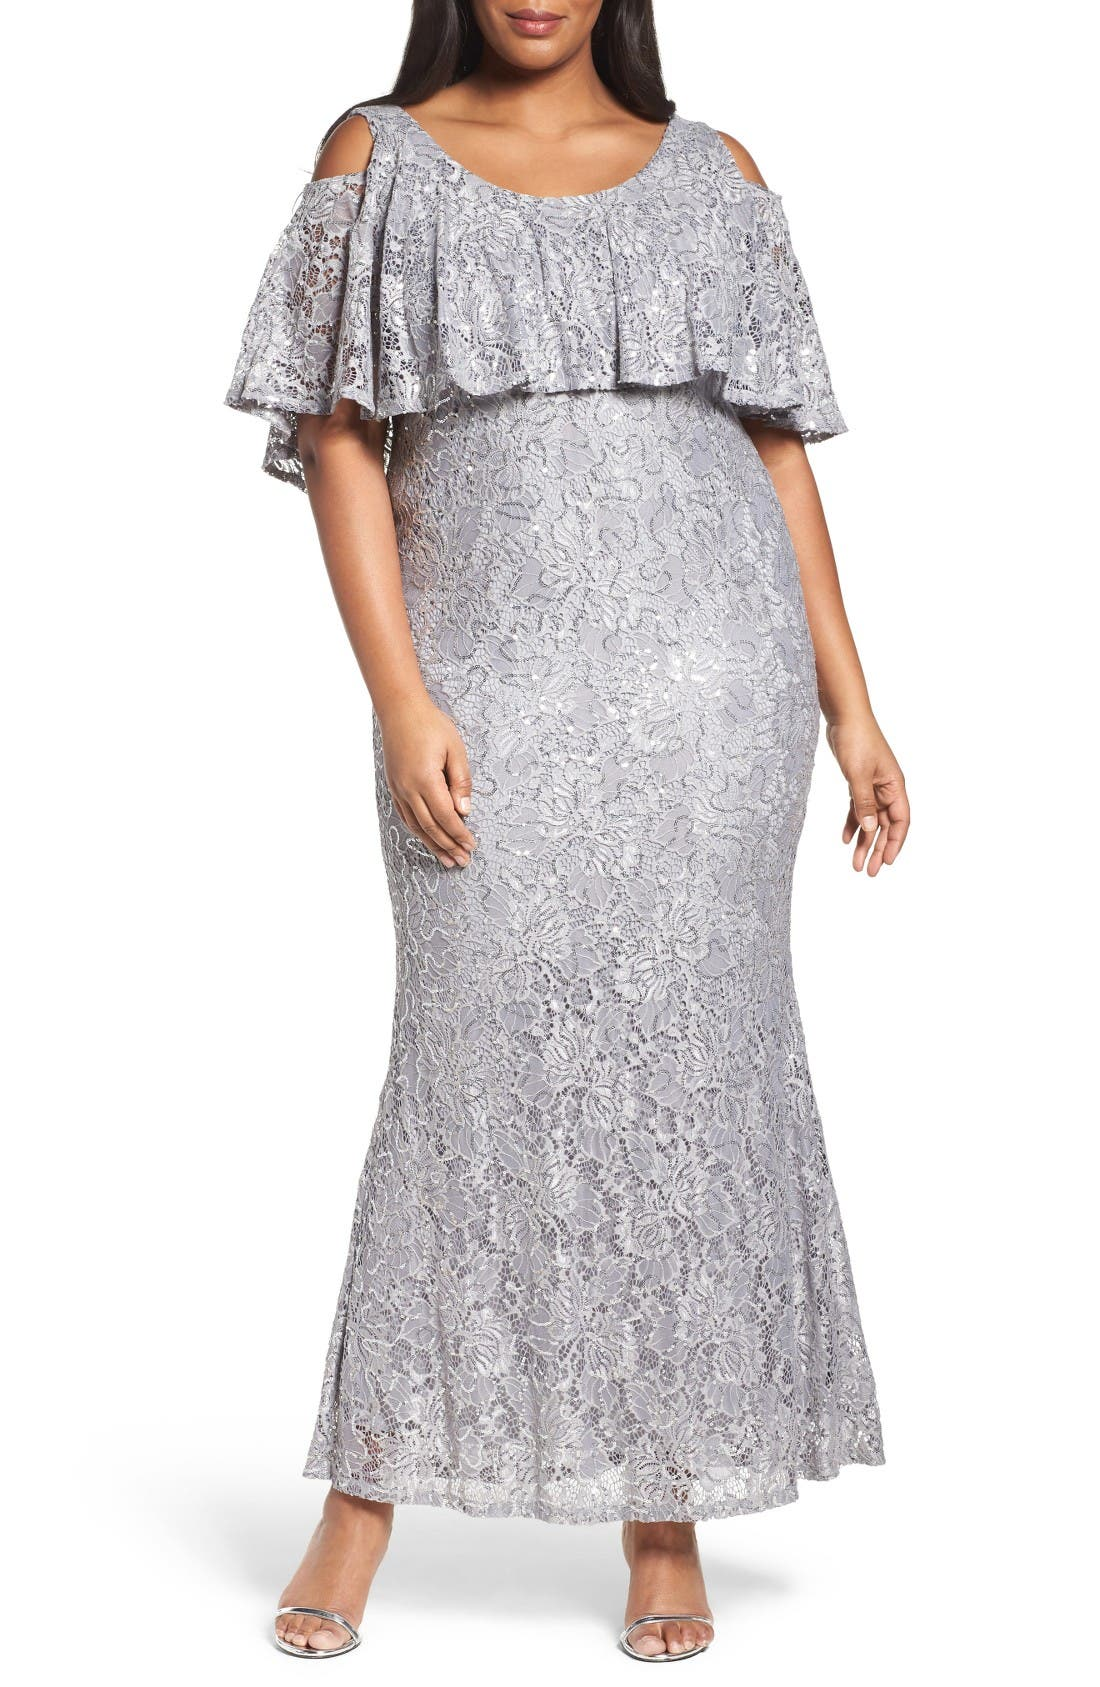 Alternate Image 1 Selected - Marina Sequin Lace Cold Shoulder Long Dress (Plus Size)